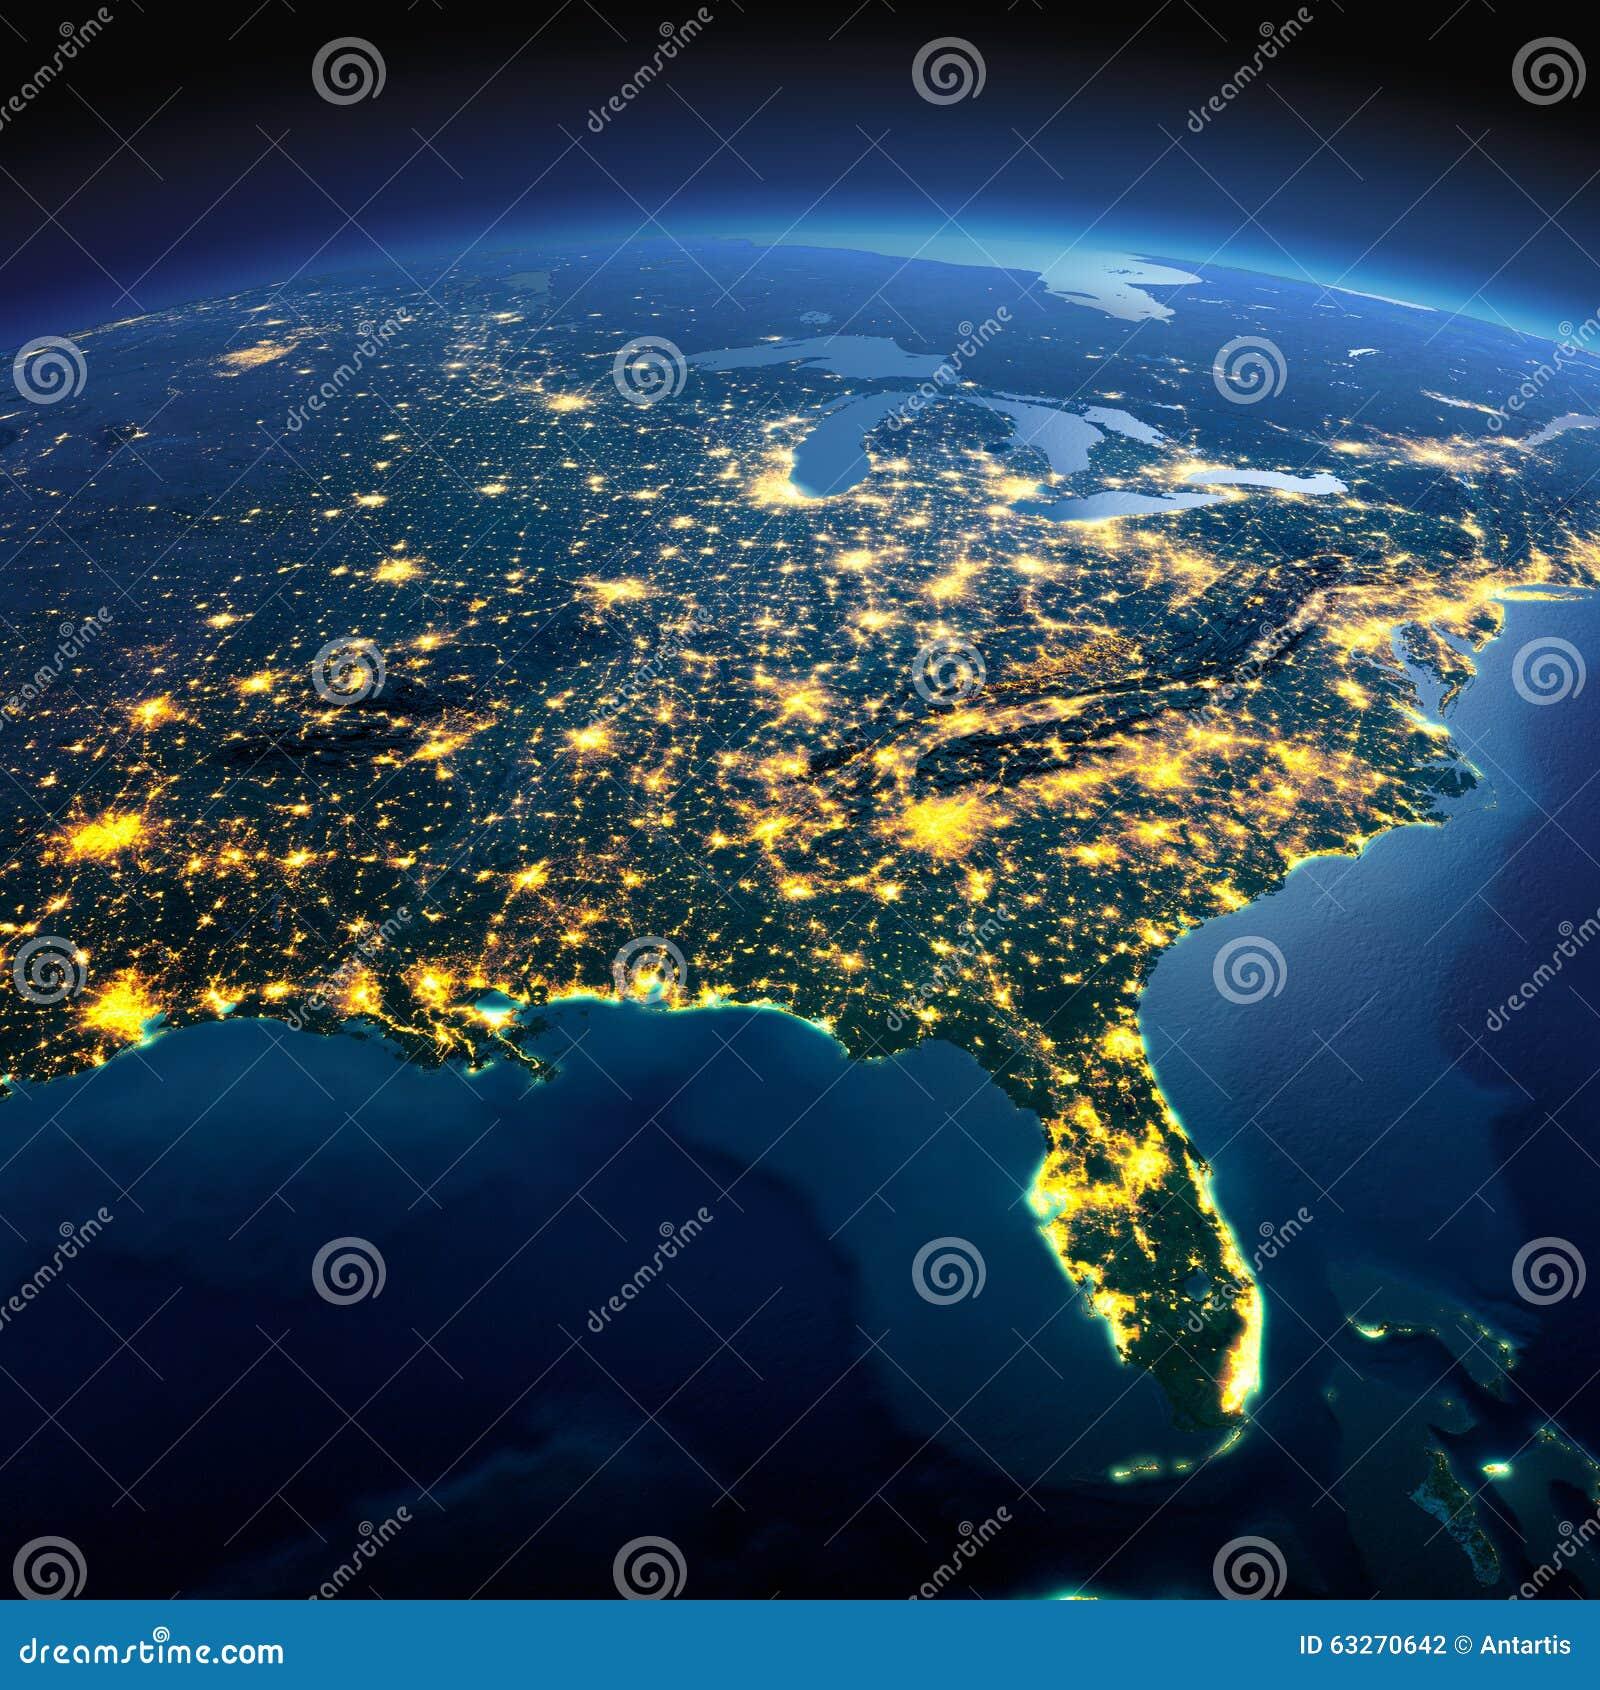 Detailed Earth. North America. USA. Gulf of Mexico and Florida o